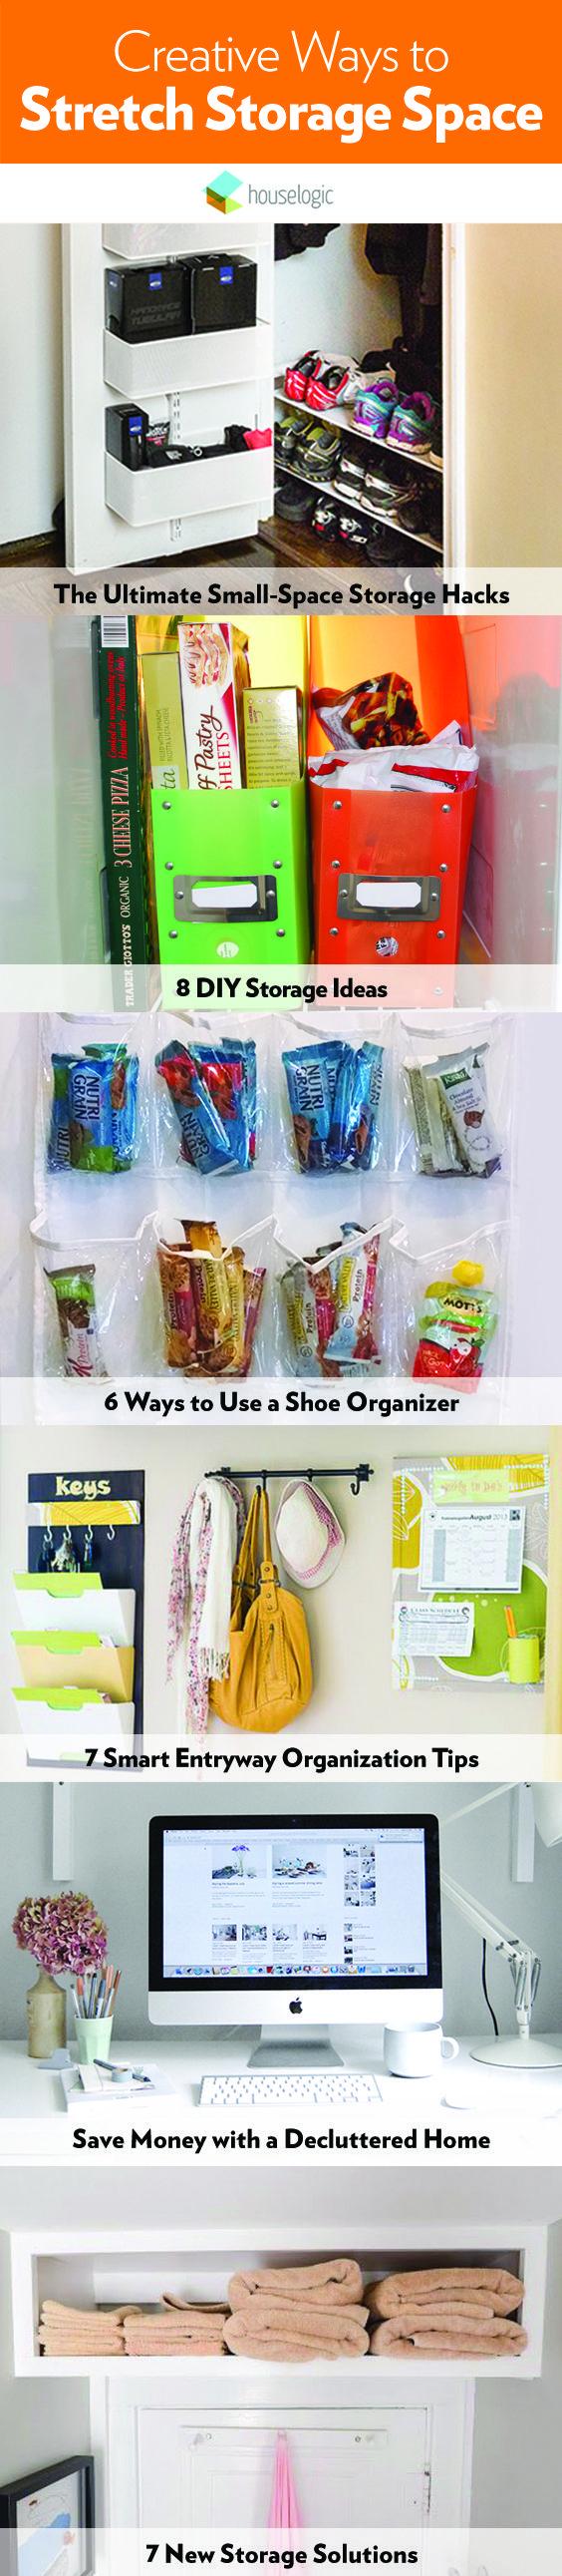 Creative Ways To Stretch Your Storage Space